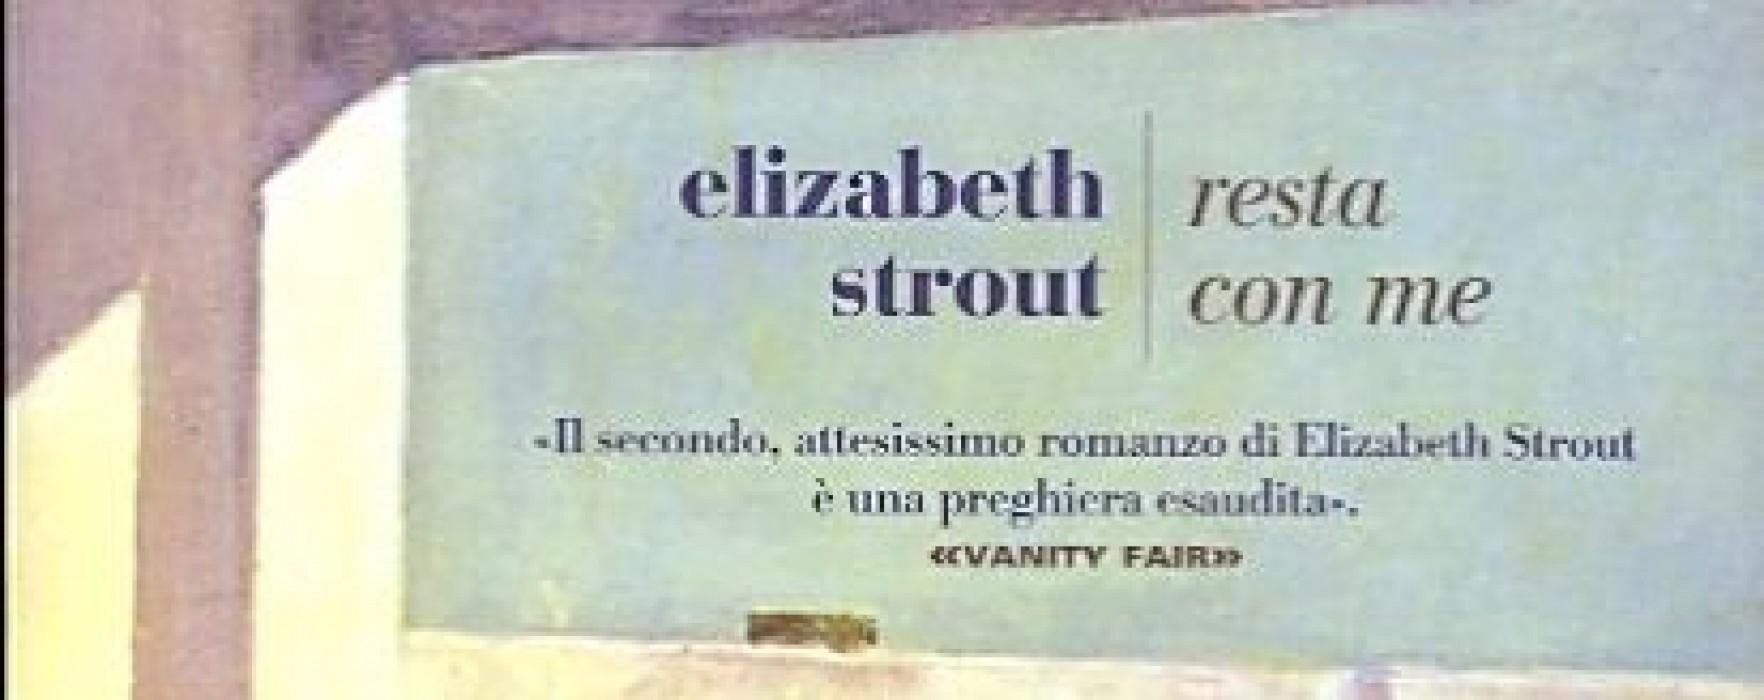 Resta con me di Elisabeth Strout